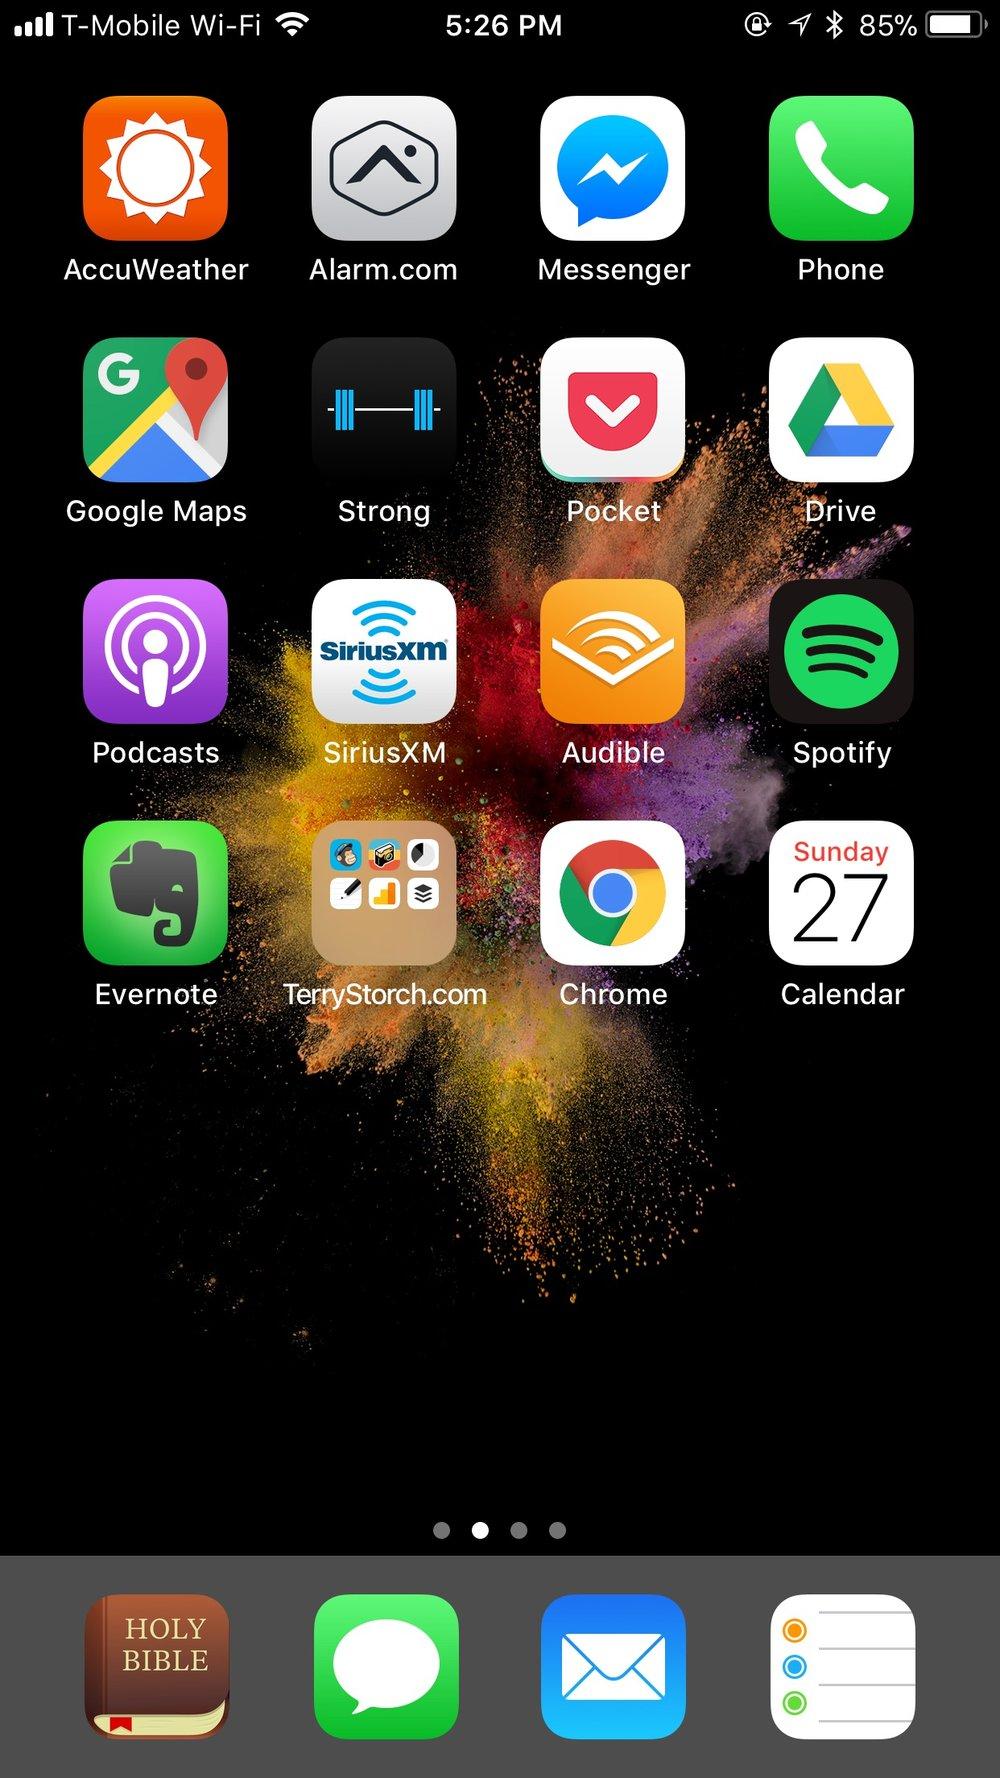 - Bible AppMailiMessageRemindersCalendarEvernoteChomePocketAudibleSpotifyGoogle PhotosStrongInstagramCircleSiriusXM